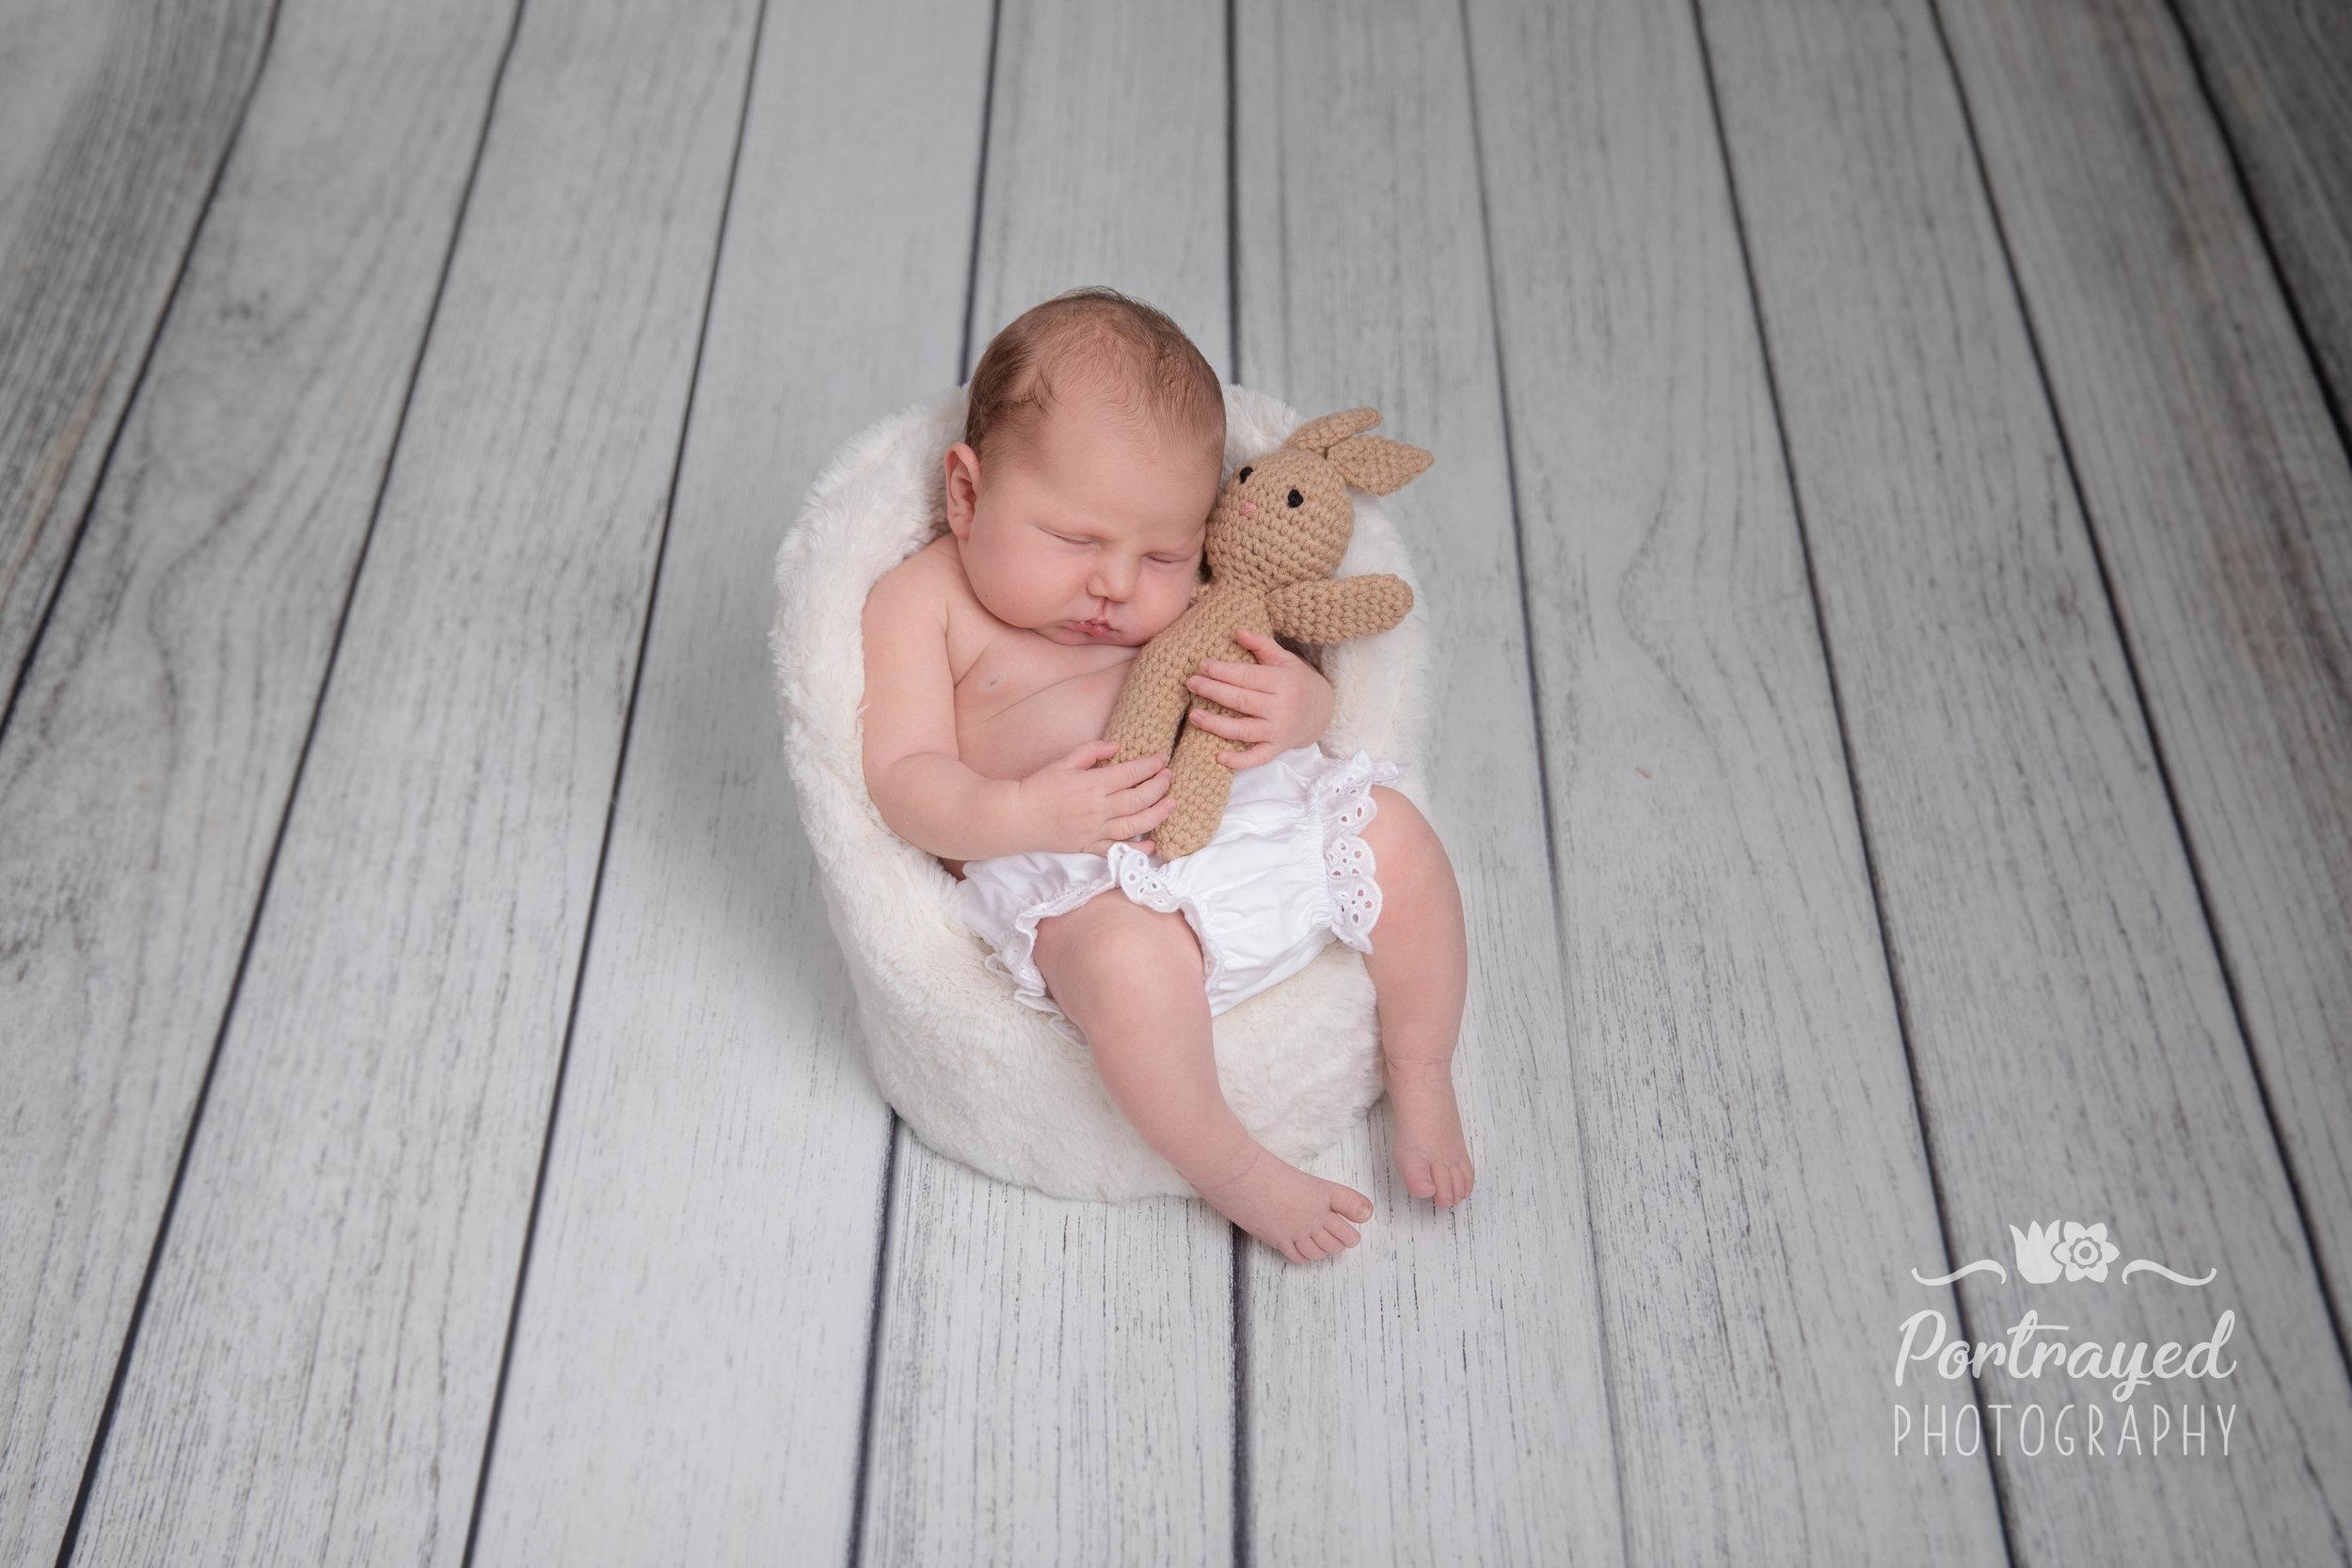 Newborn photography, London, SE21